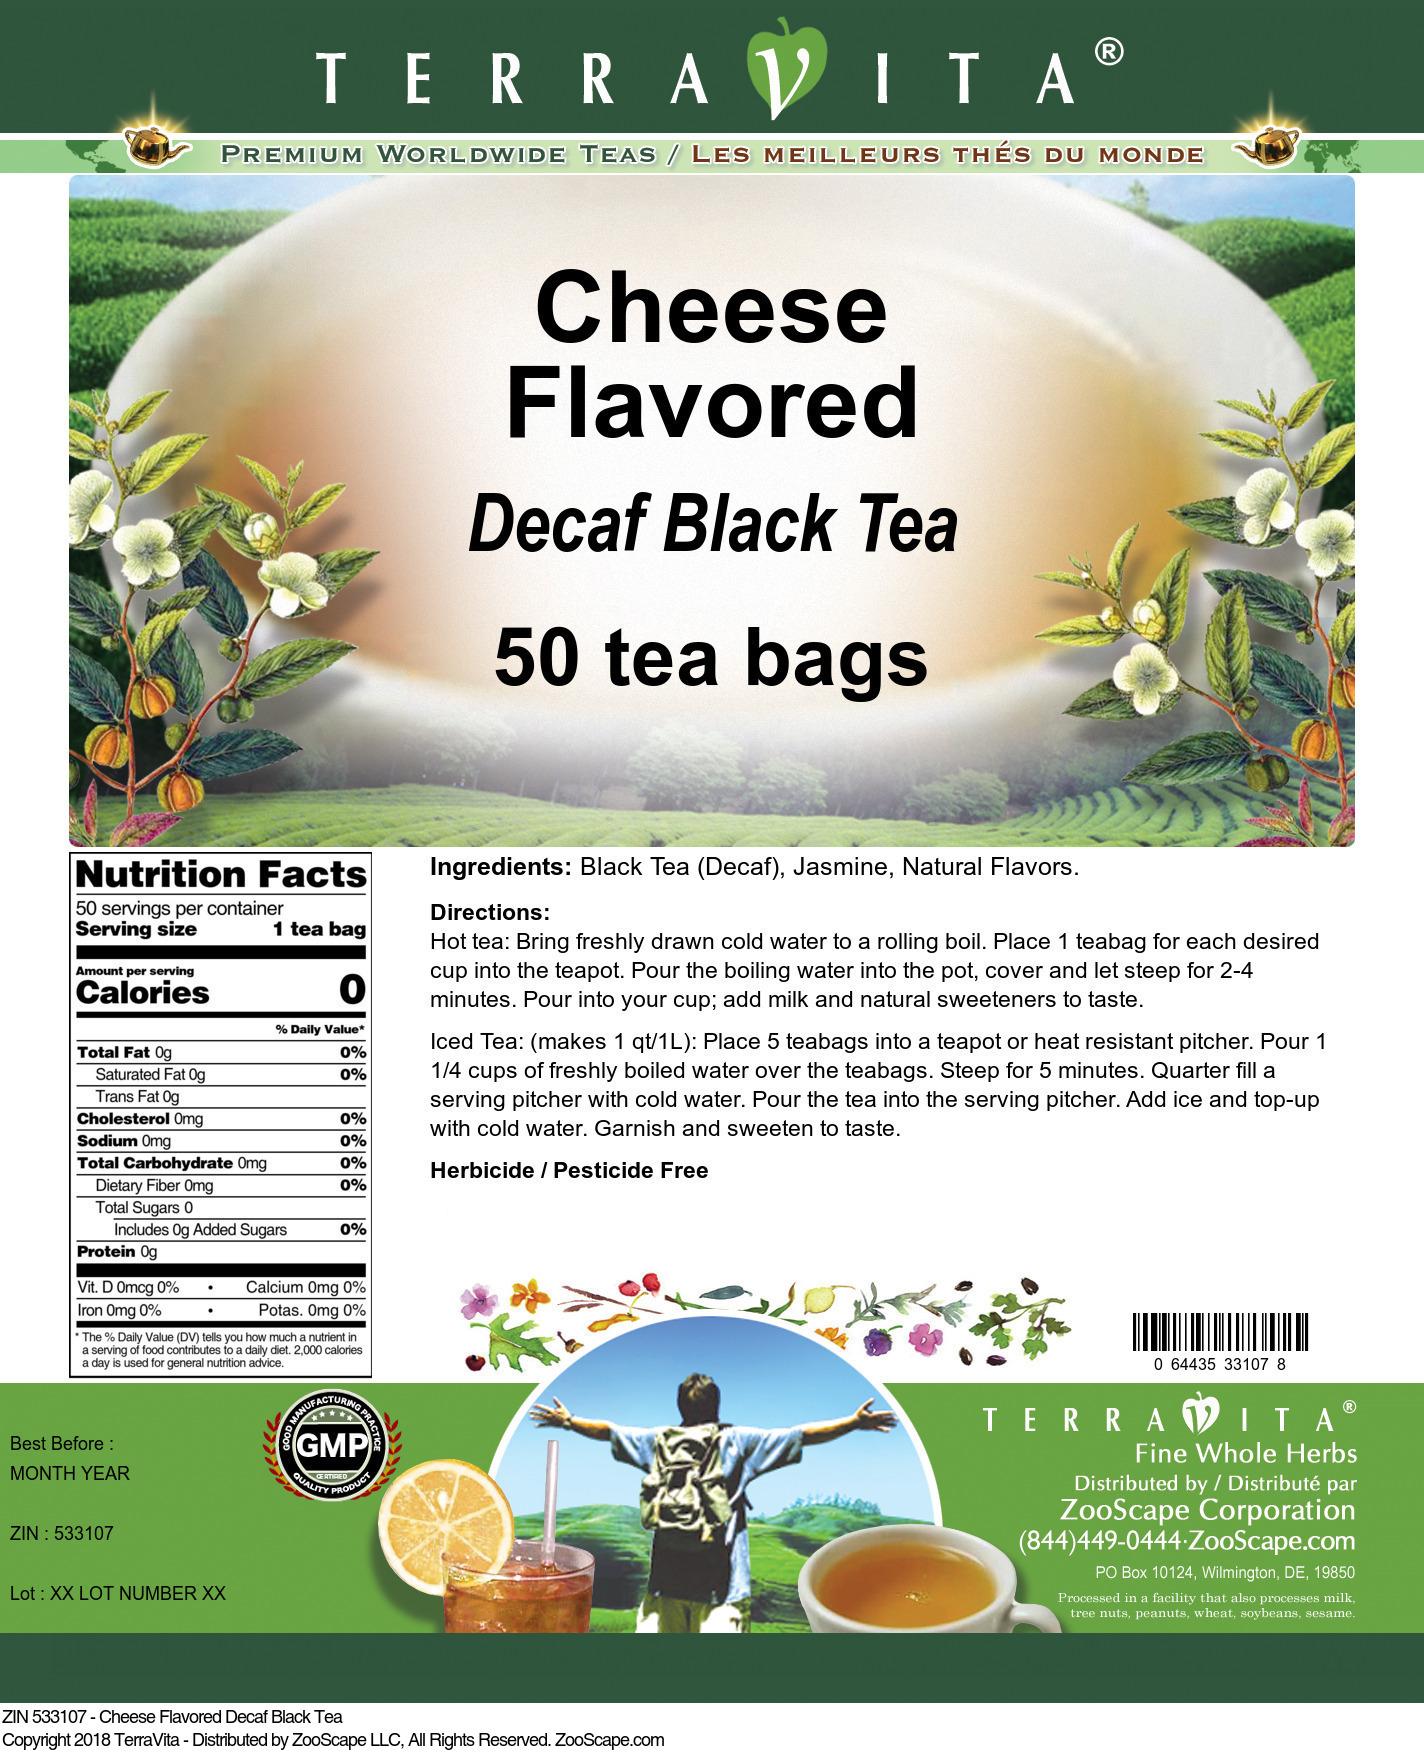 Cheese Flavored Decaf Black Tea